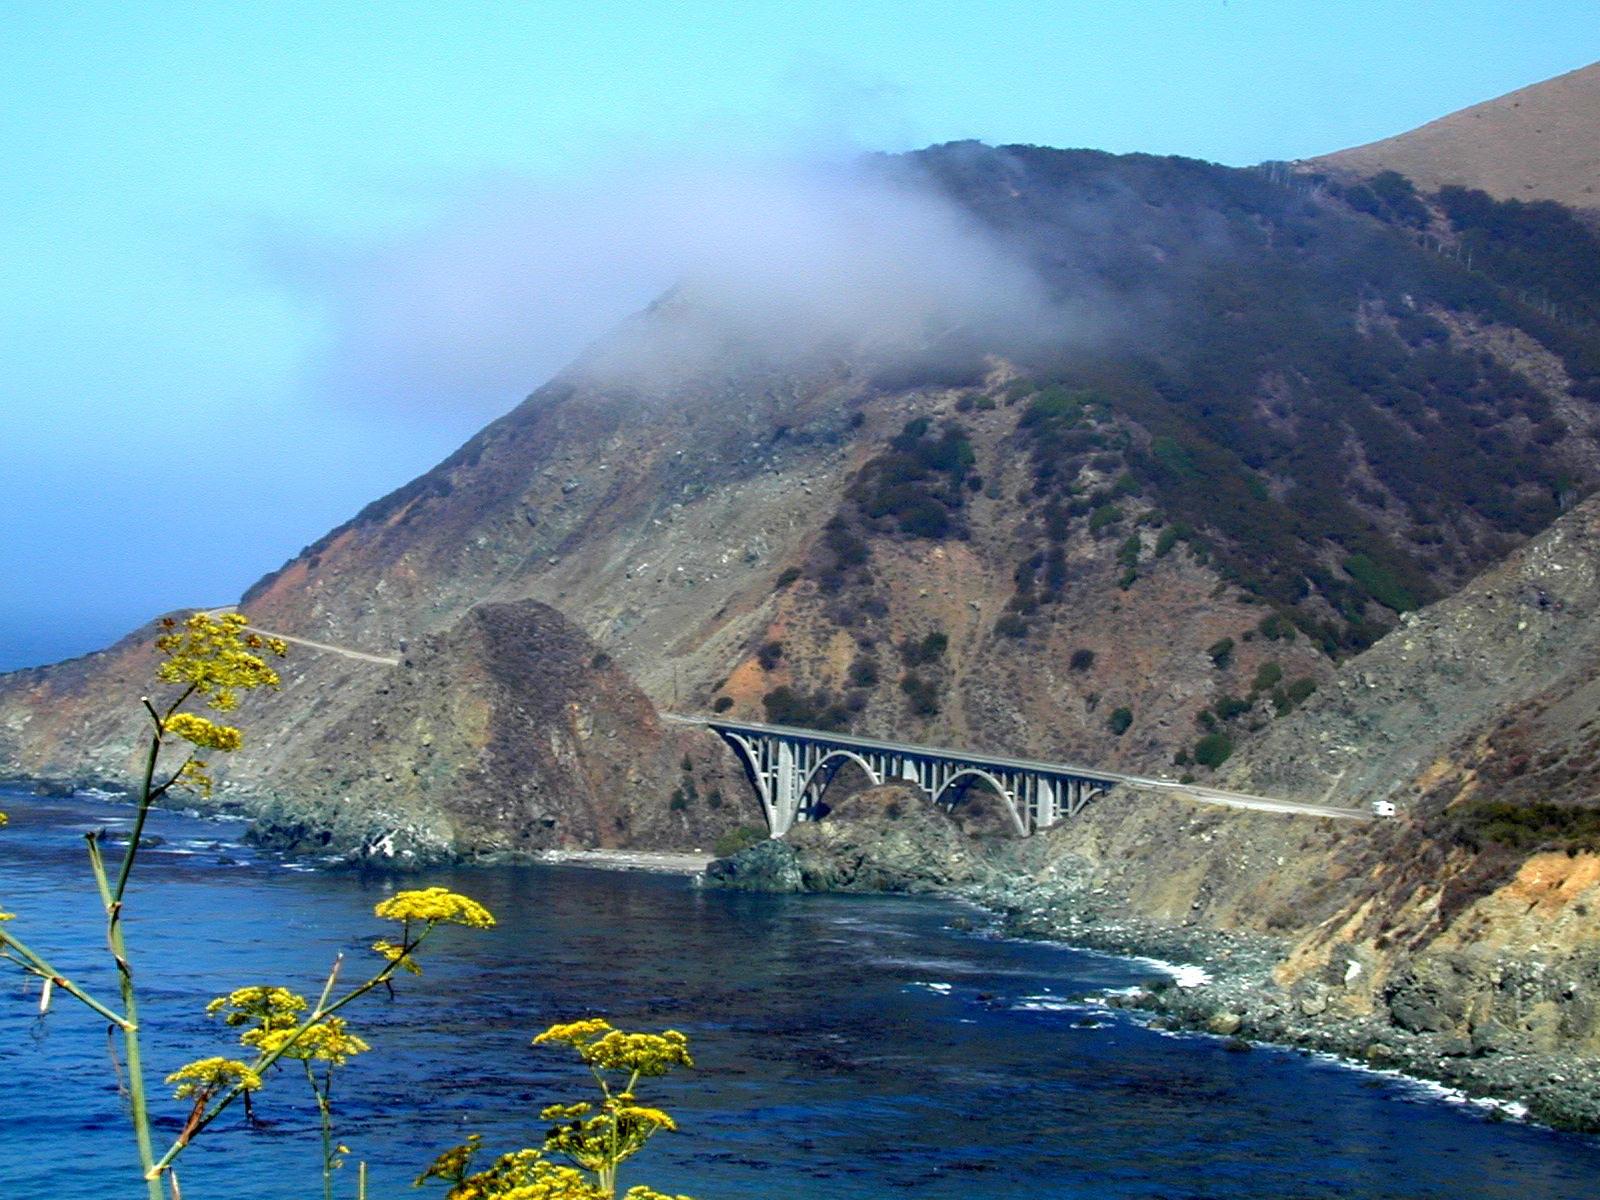 Big Sur coastal drive, USA